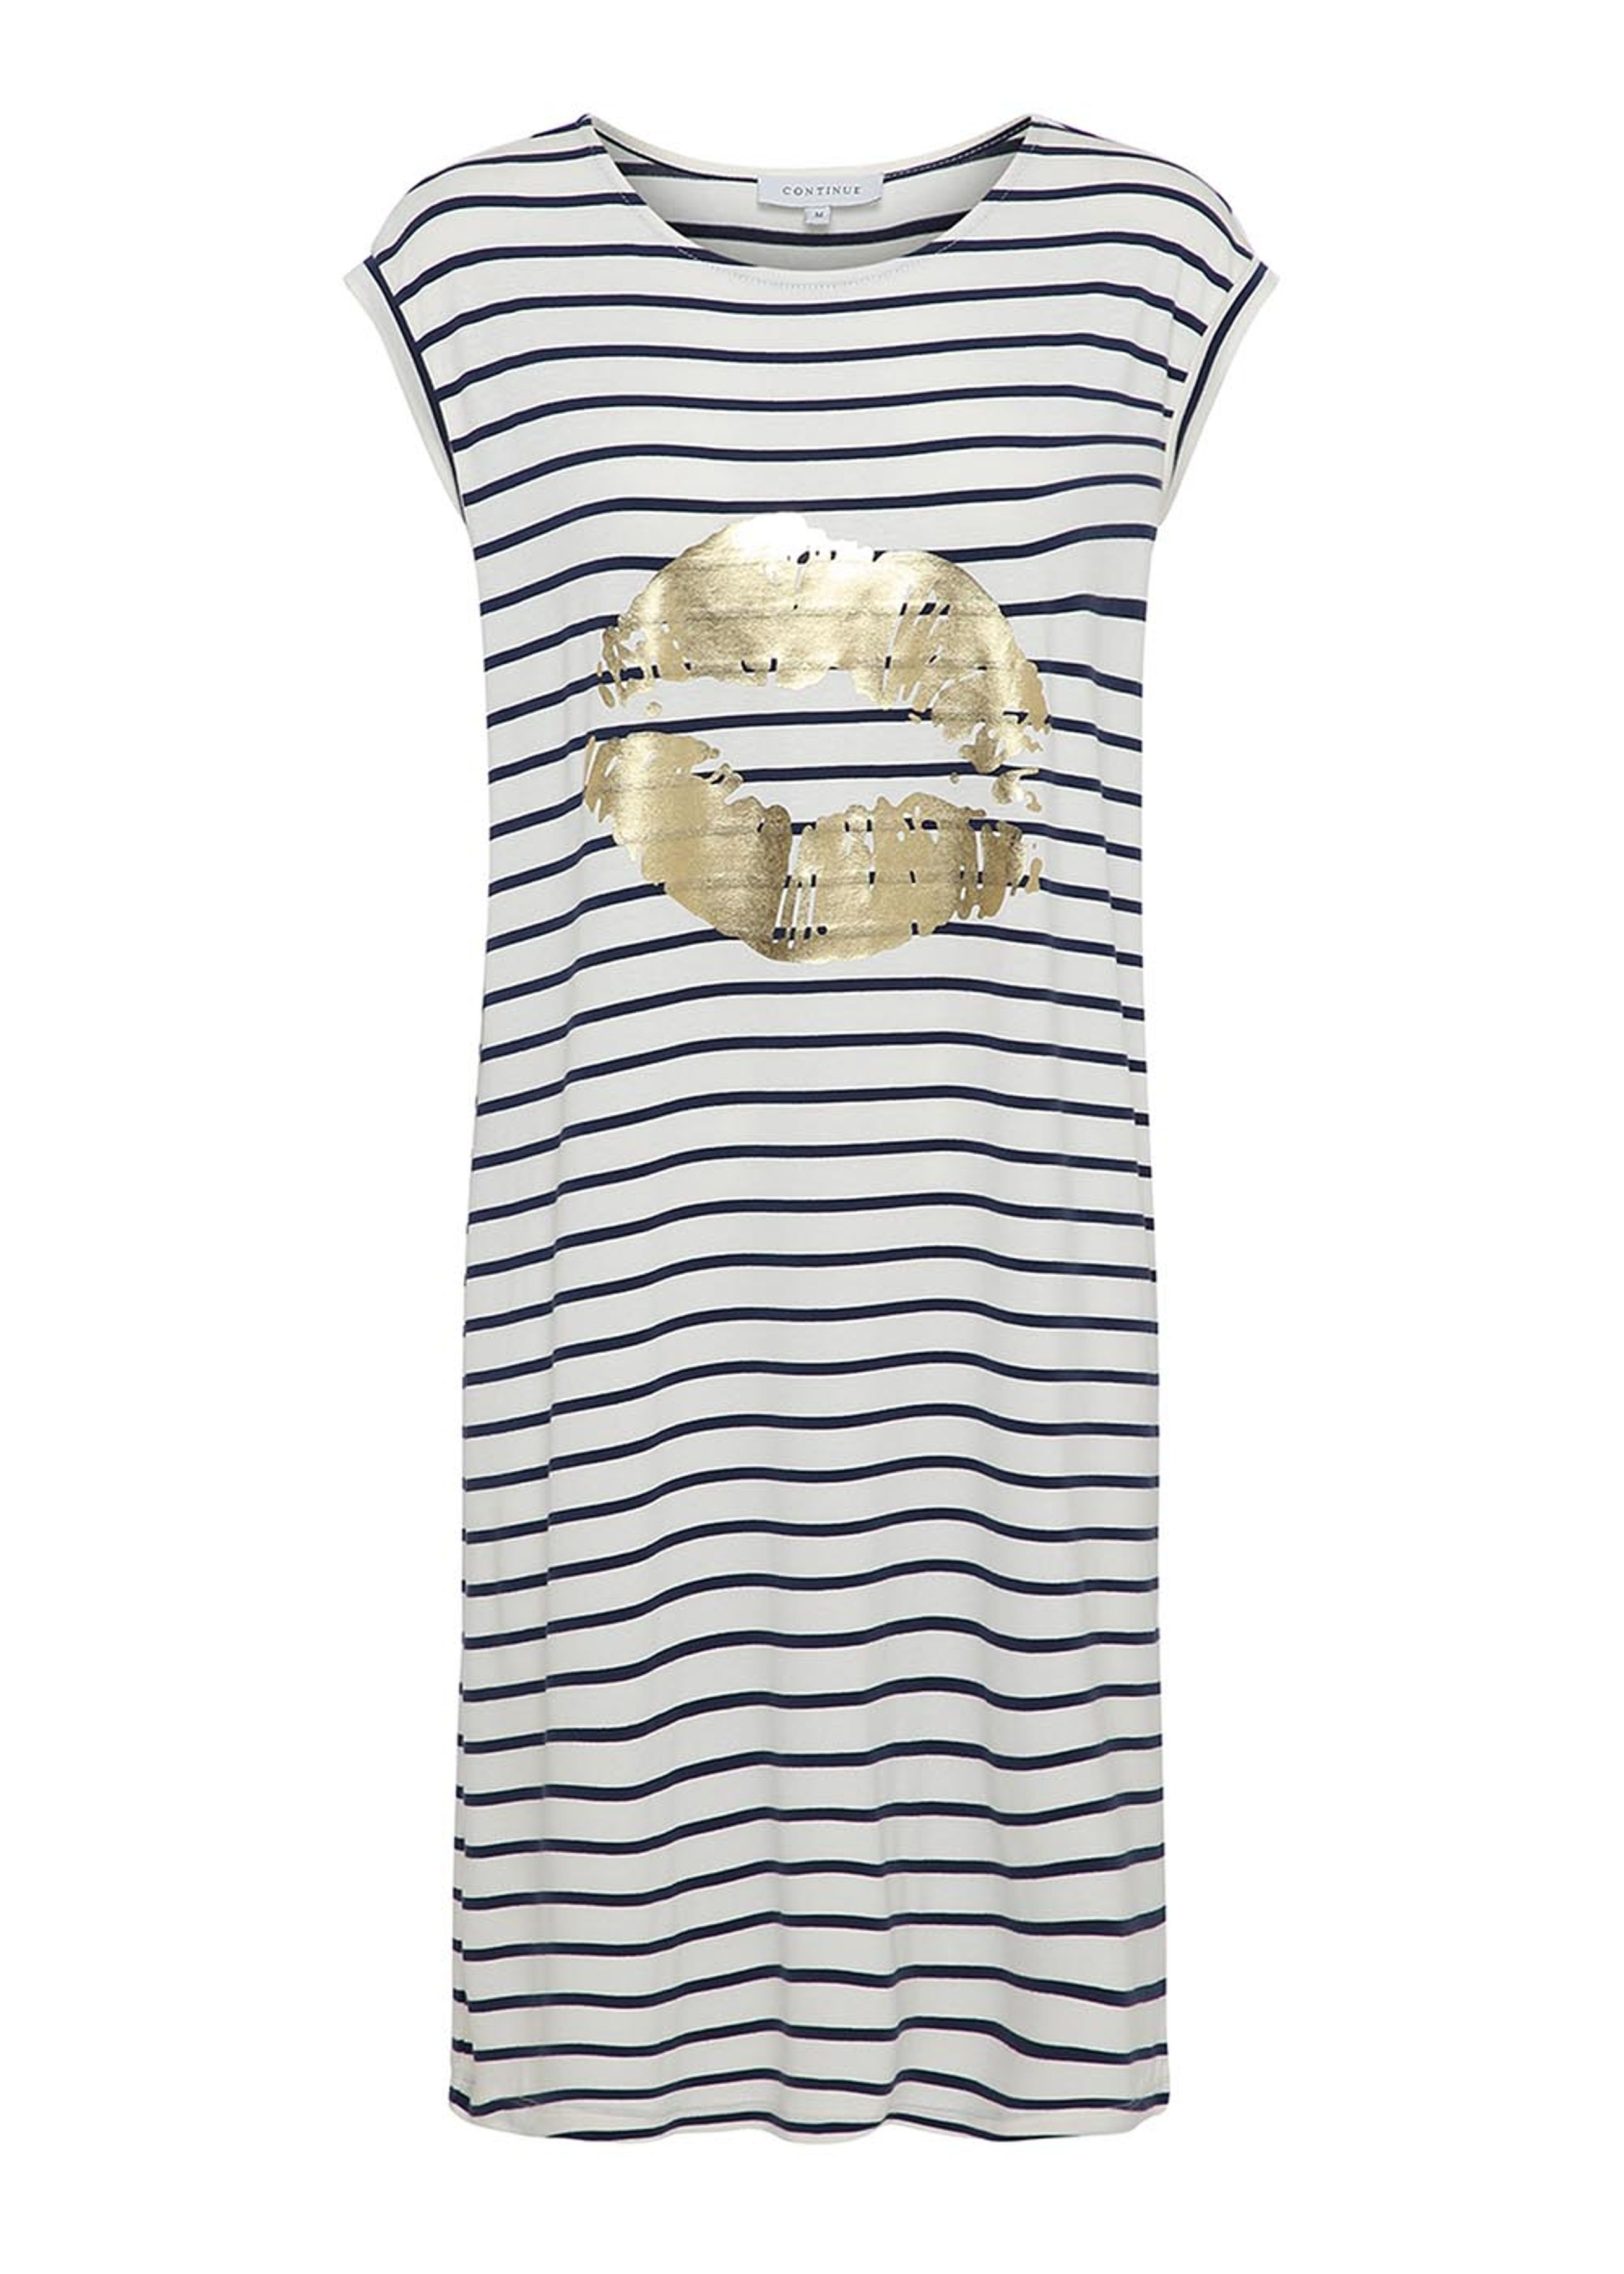 dicte dress - stribet kjole fra continue